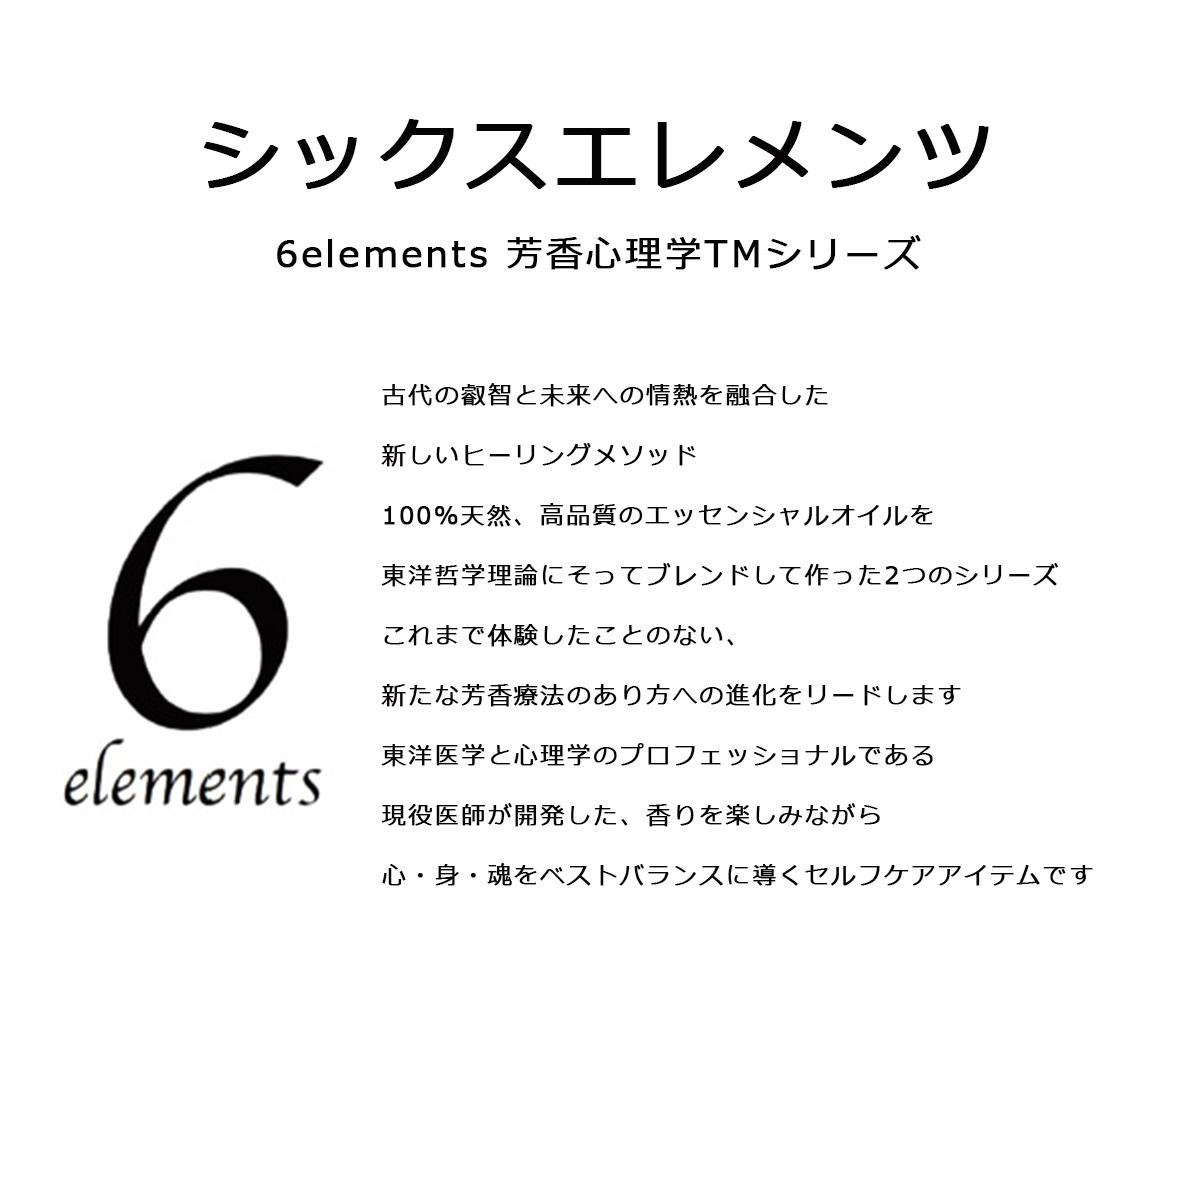 6elements Japan 六行ROKUGYO 火KA 2mL 【 翌日配達 送料無料 】 【 アロマ アロマテラピー 天然成分 高品質 エッセンシャルオイル  】